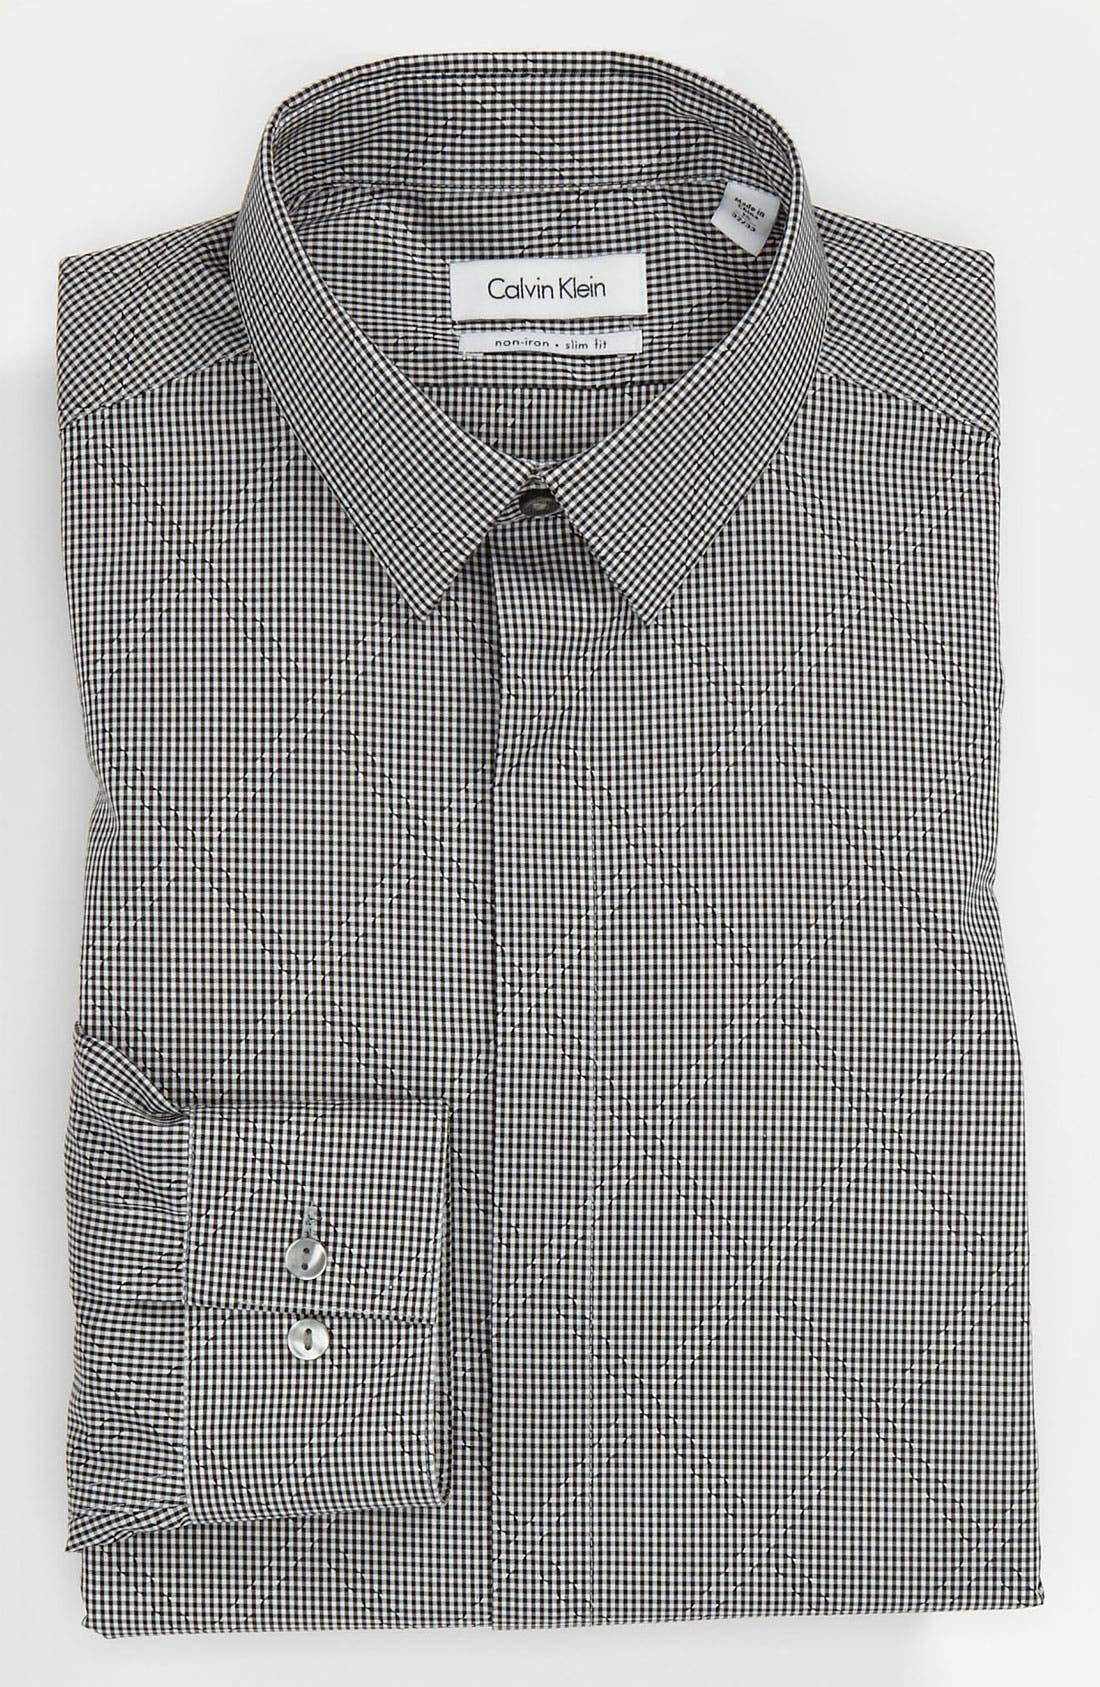 Main Image - Calvin Klein 'Como Check' Slim Fit Dress Shirt